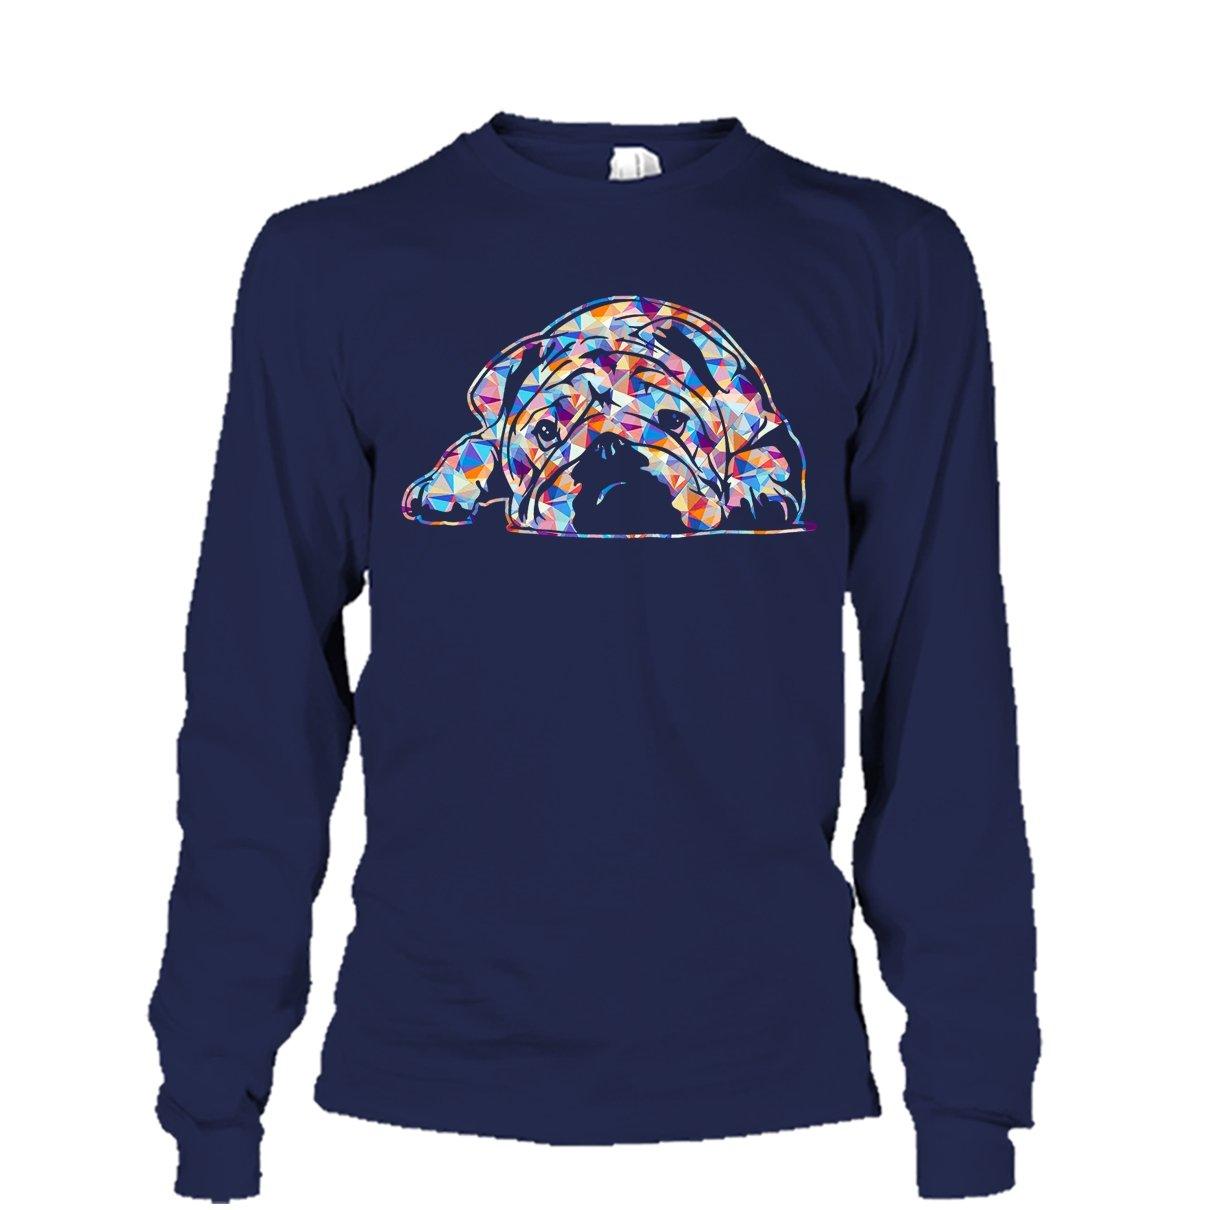 English Bulldog Cool Tshirt English Bulldog Geometric Colorful Tee Shirt Design for Men and Women